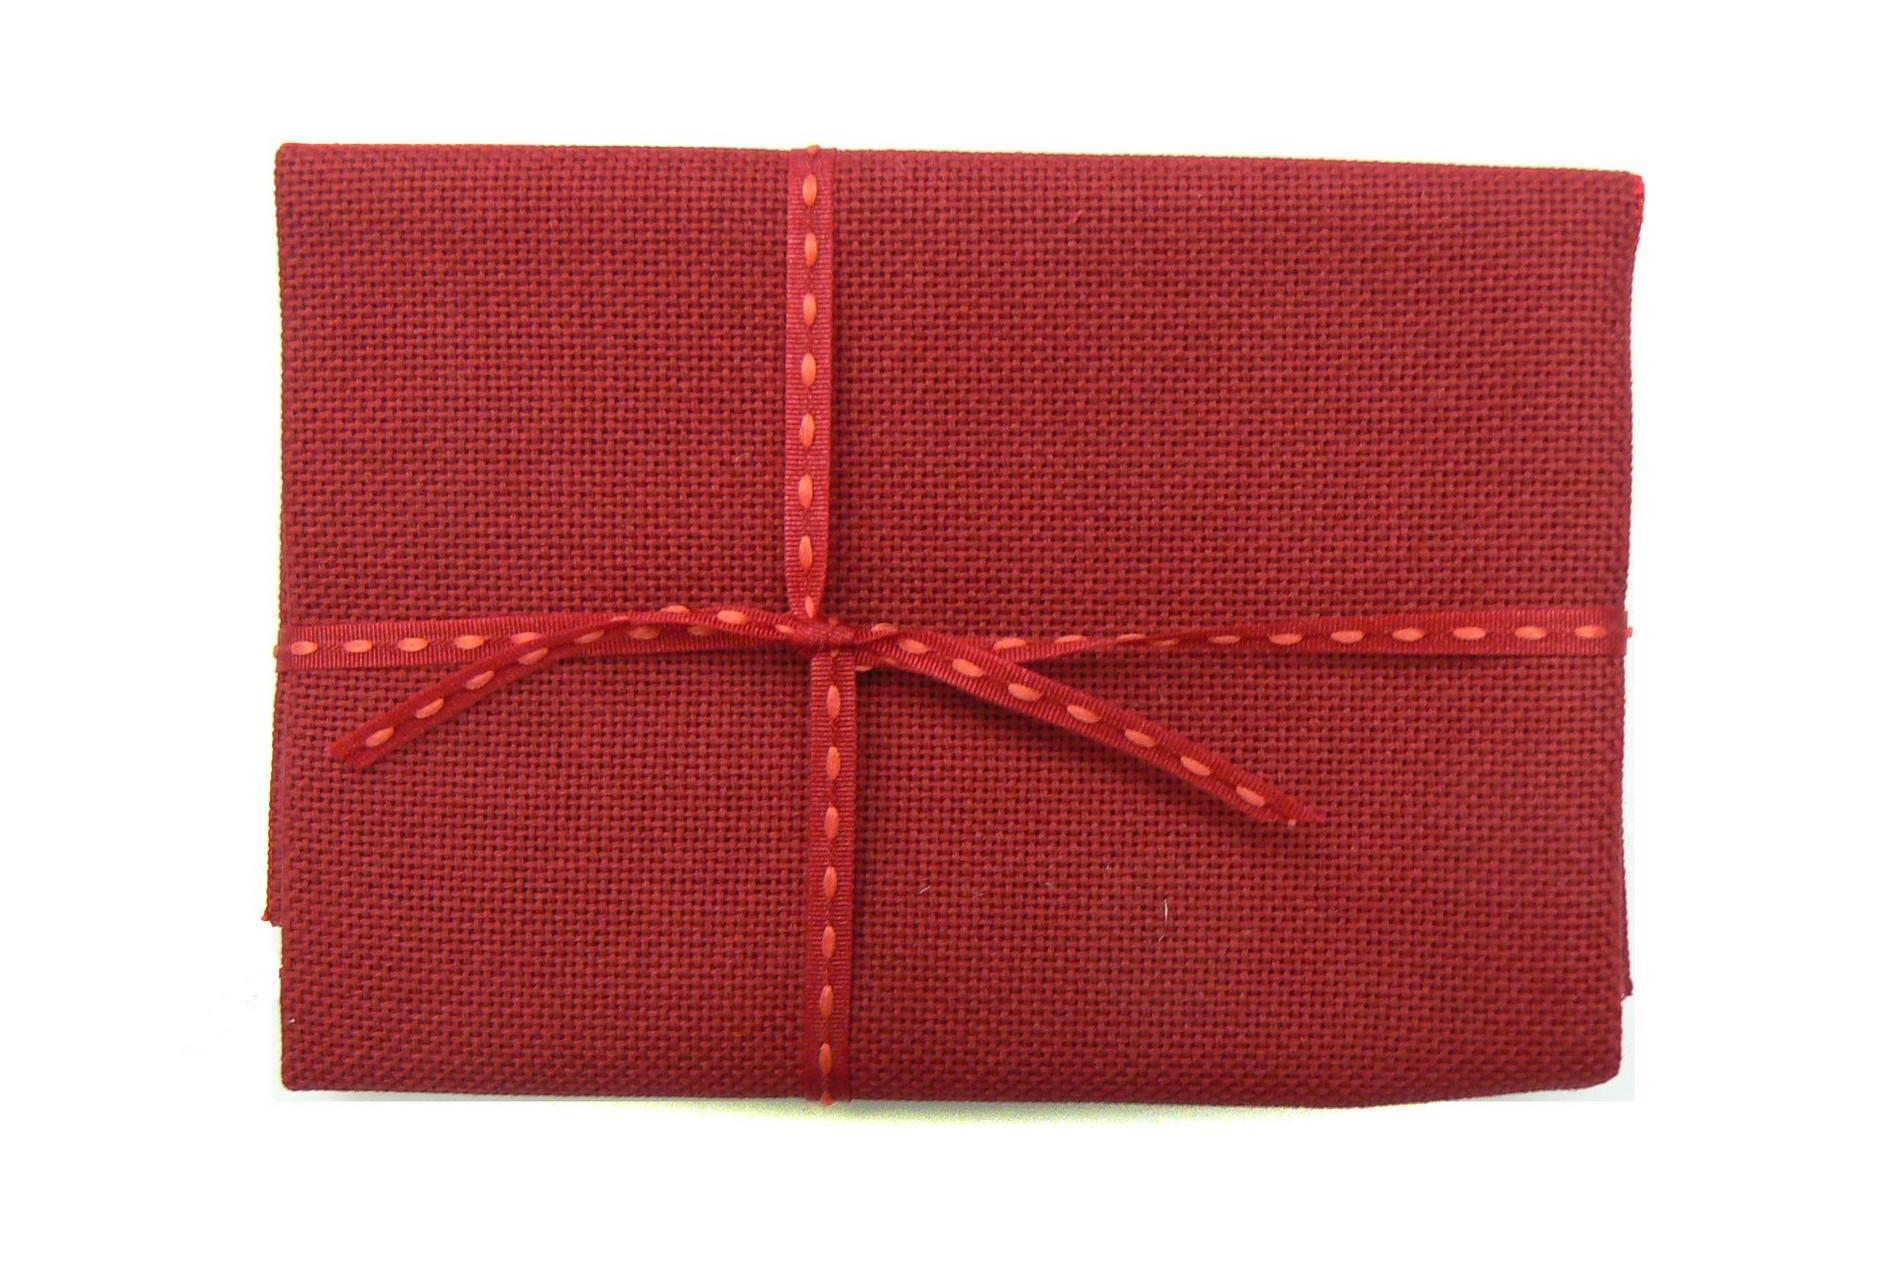 Etamine zweigart lugana 10 fils couleur rouge bordeaux 906 autour d 39 elsa - Couleur rouge bordeaux ...